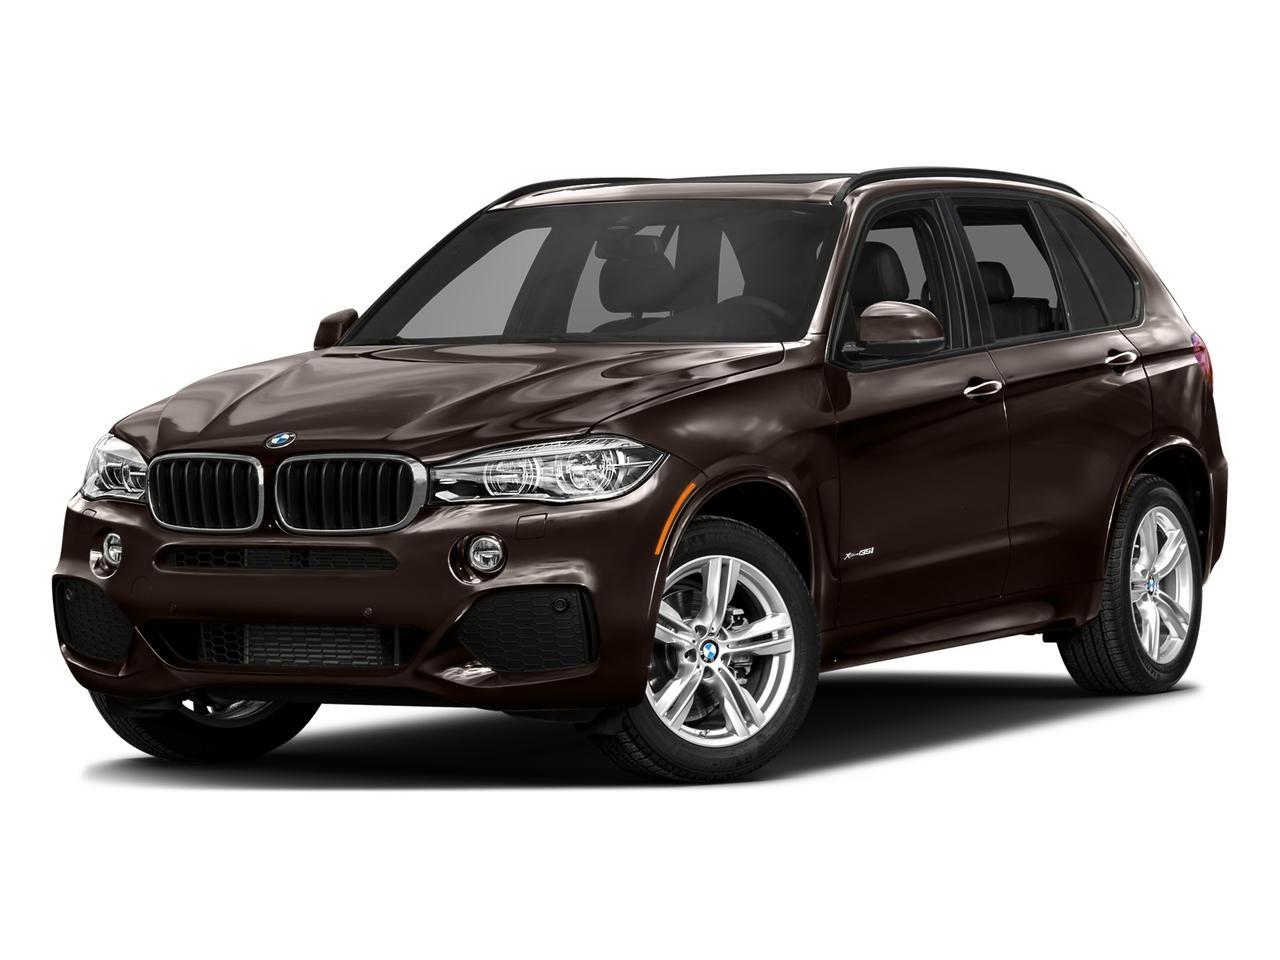 2017 BMW X5 xDrive35i Vehicle Photo in Temple, TX 76502